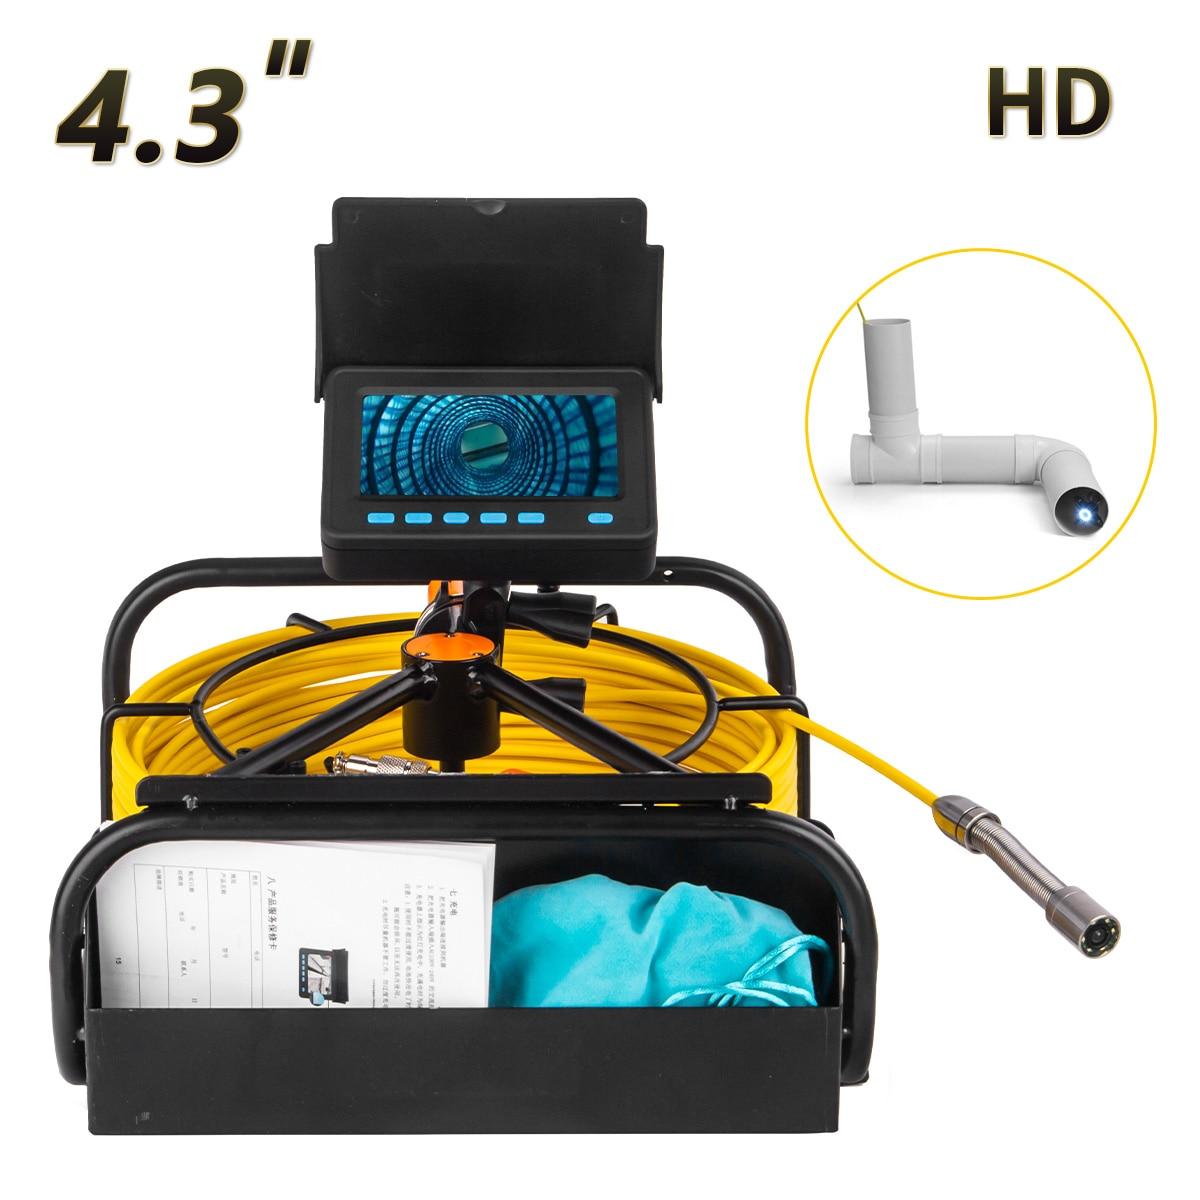 WP9604B الصناعية استنزاف مواسير صرف التفتيش كاميرا فيديو المنظار حجم صغير وسهل الحمل ، وبطاقة 16GB مجانية